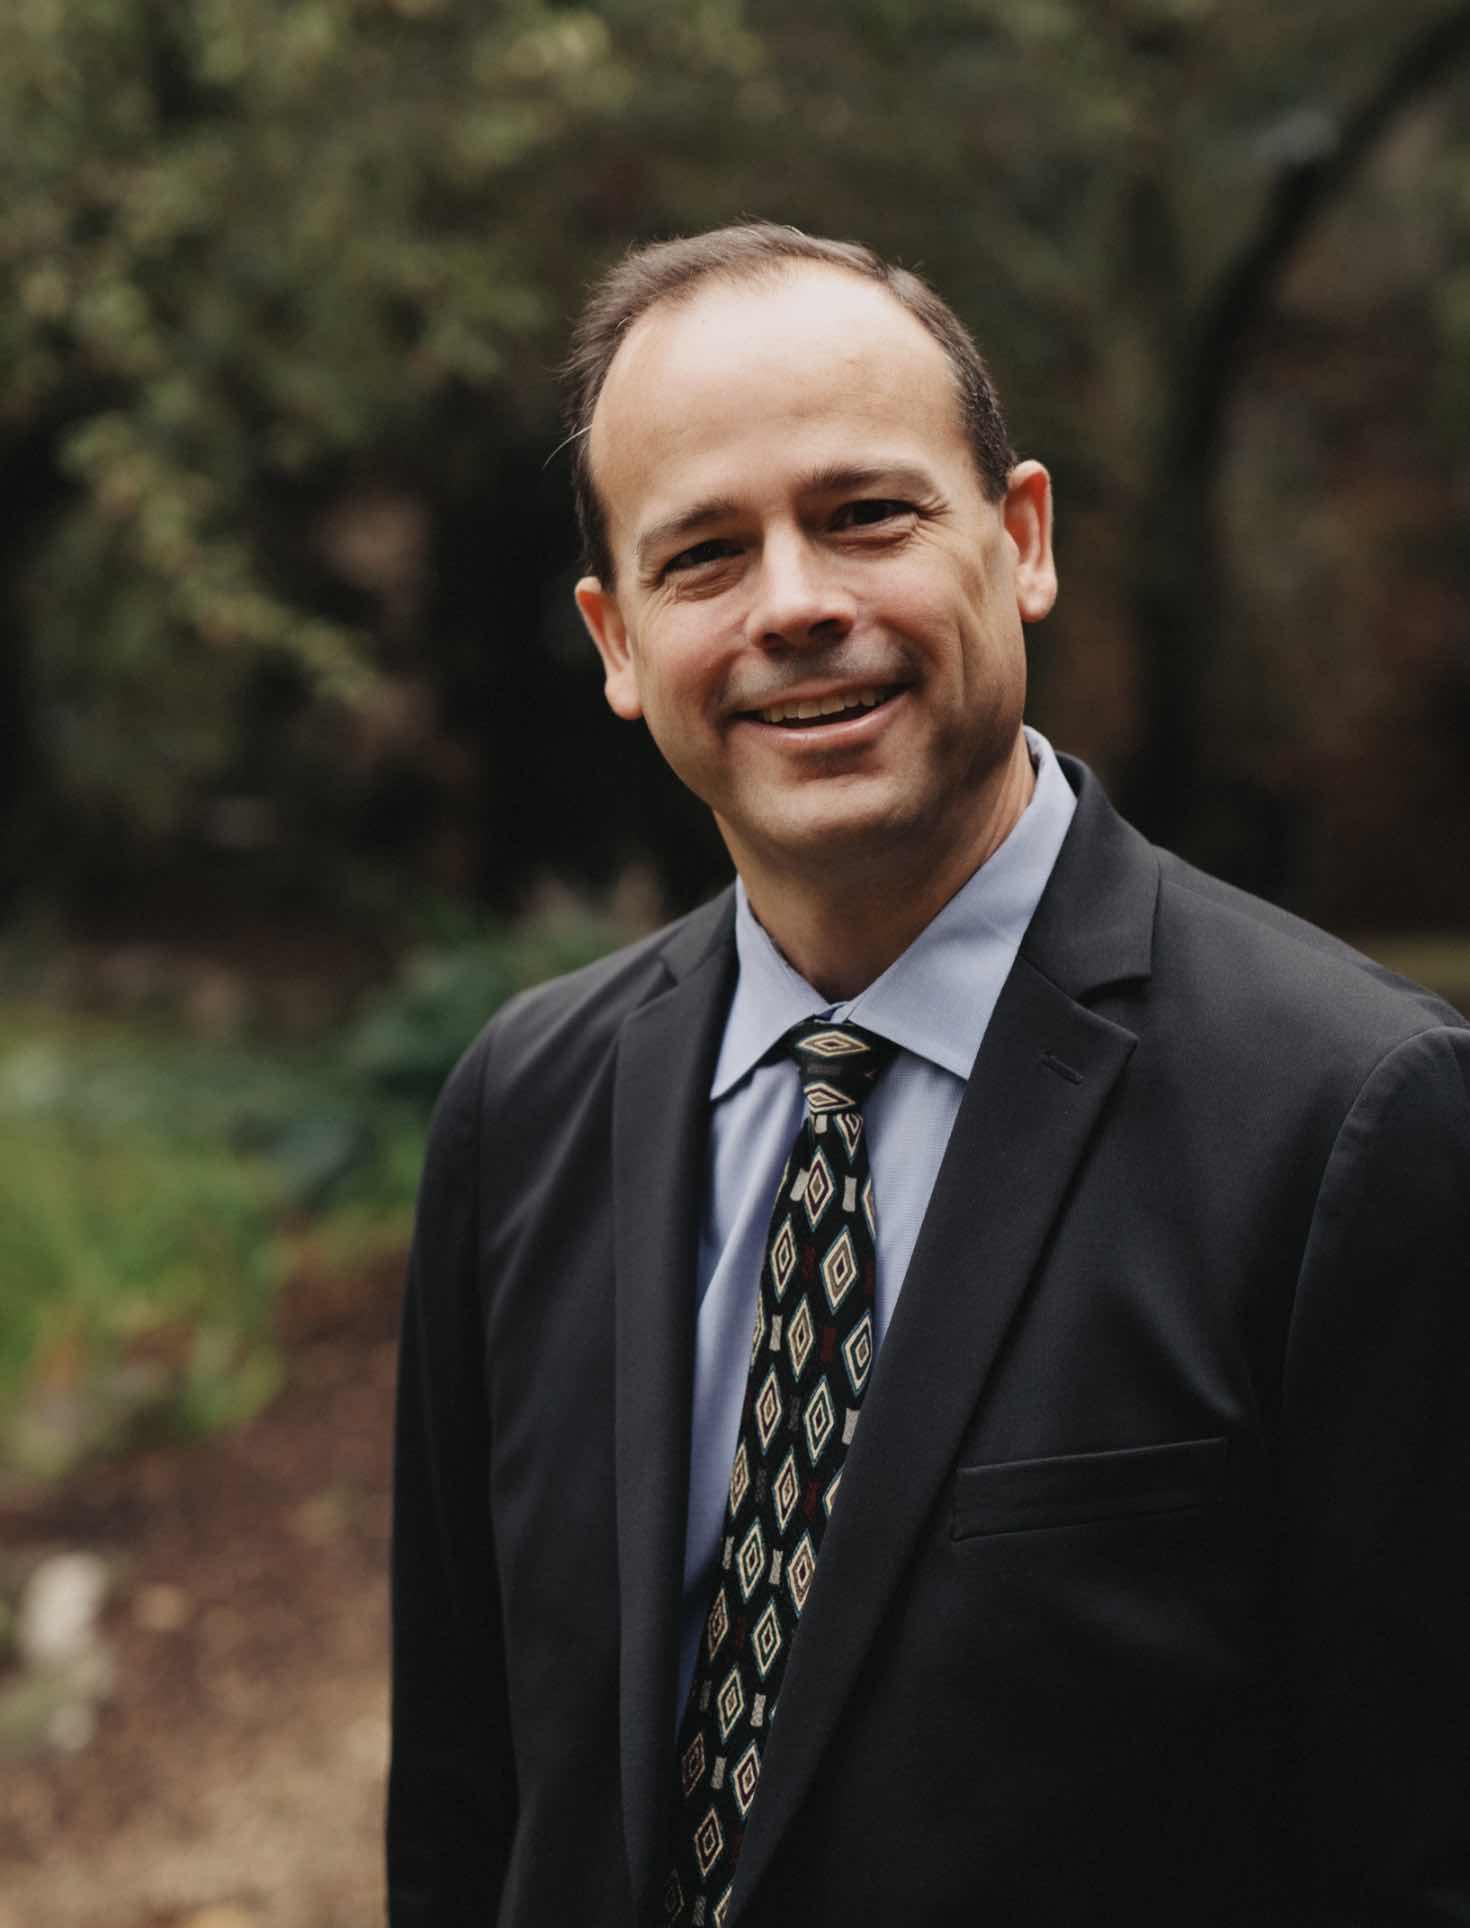 Michael Kloess, MD, AAFP